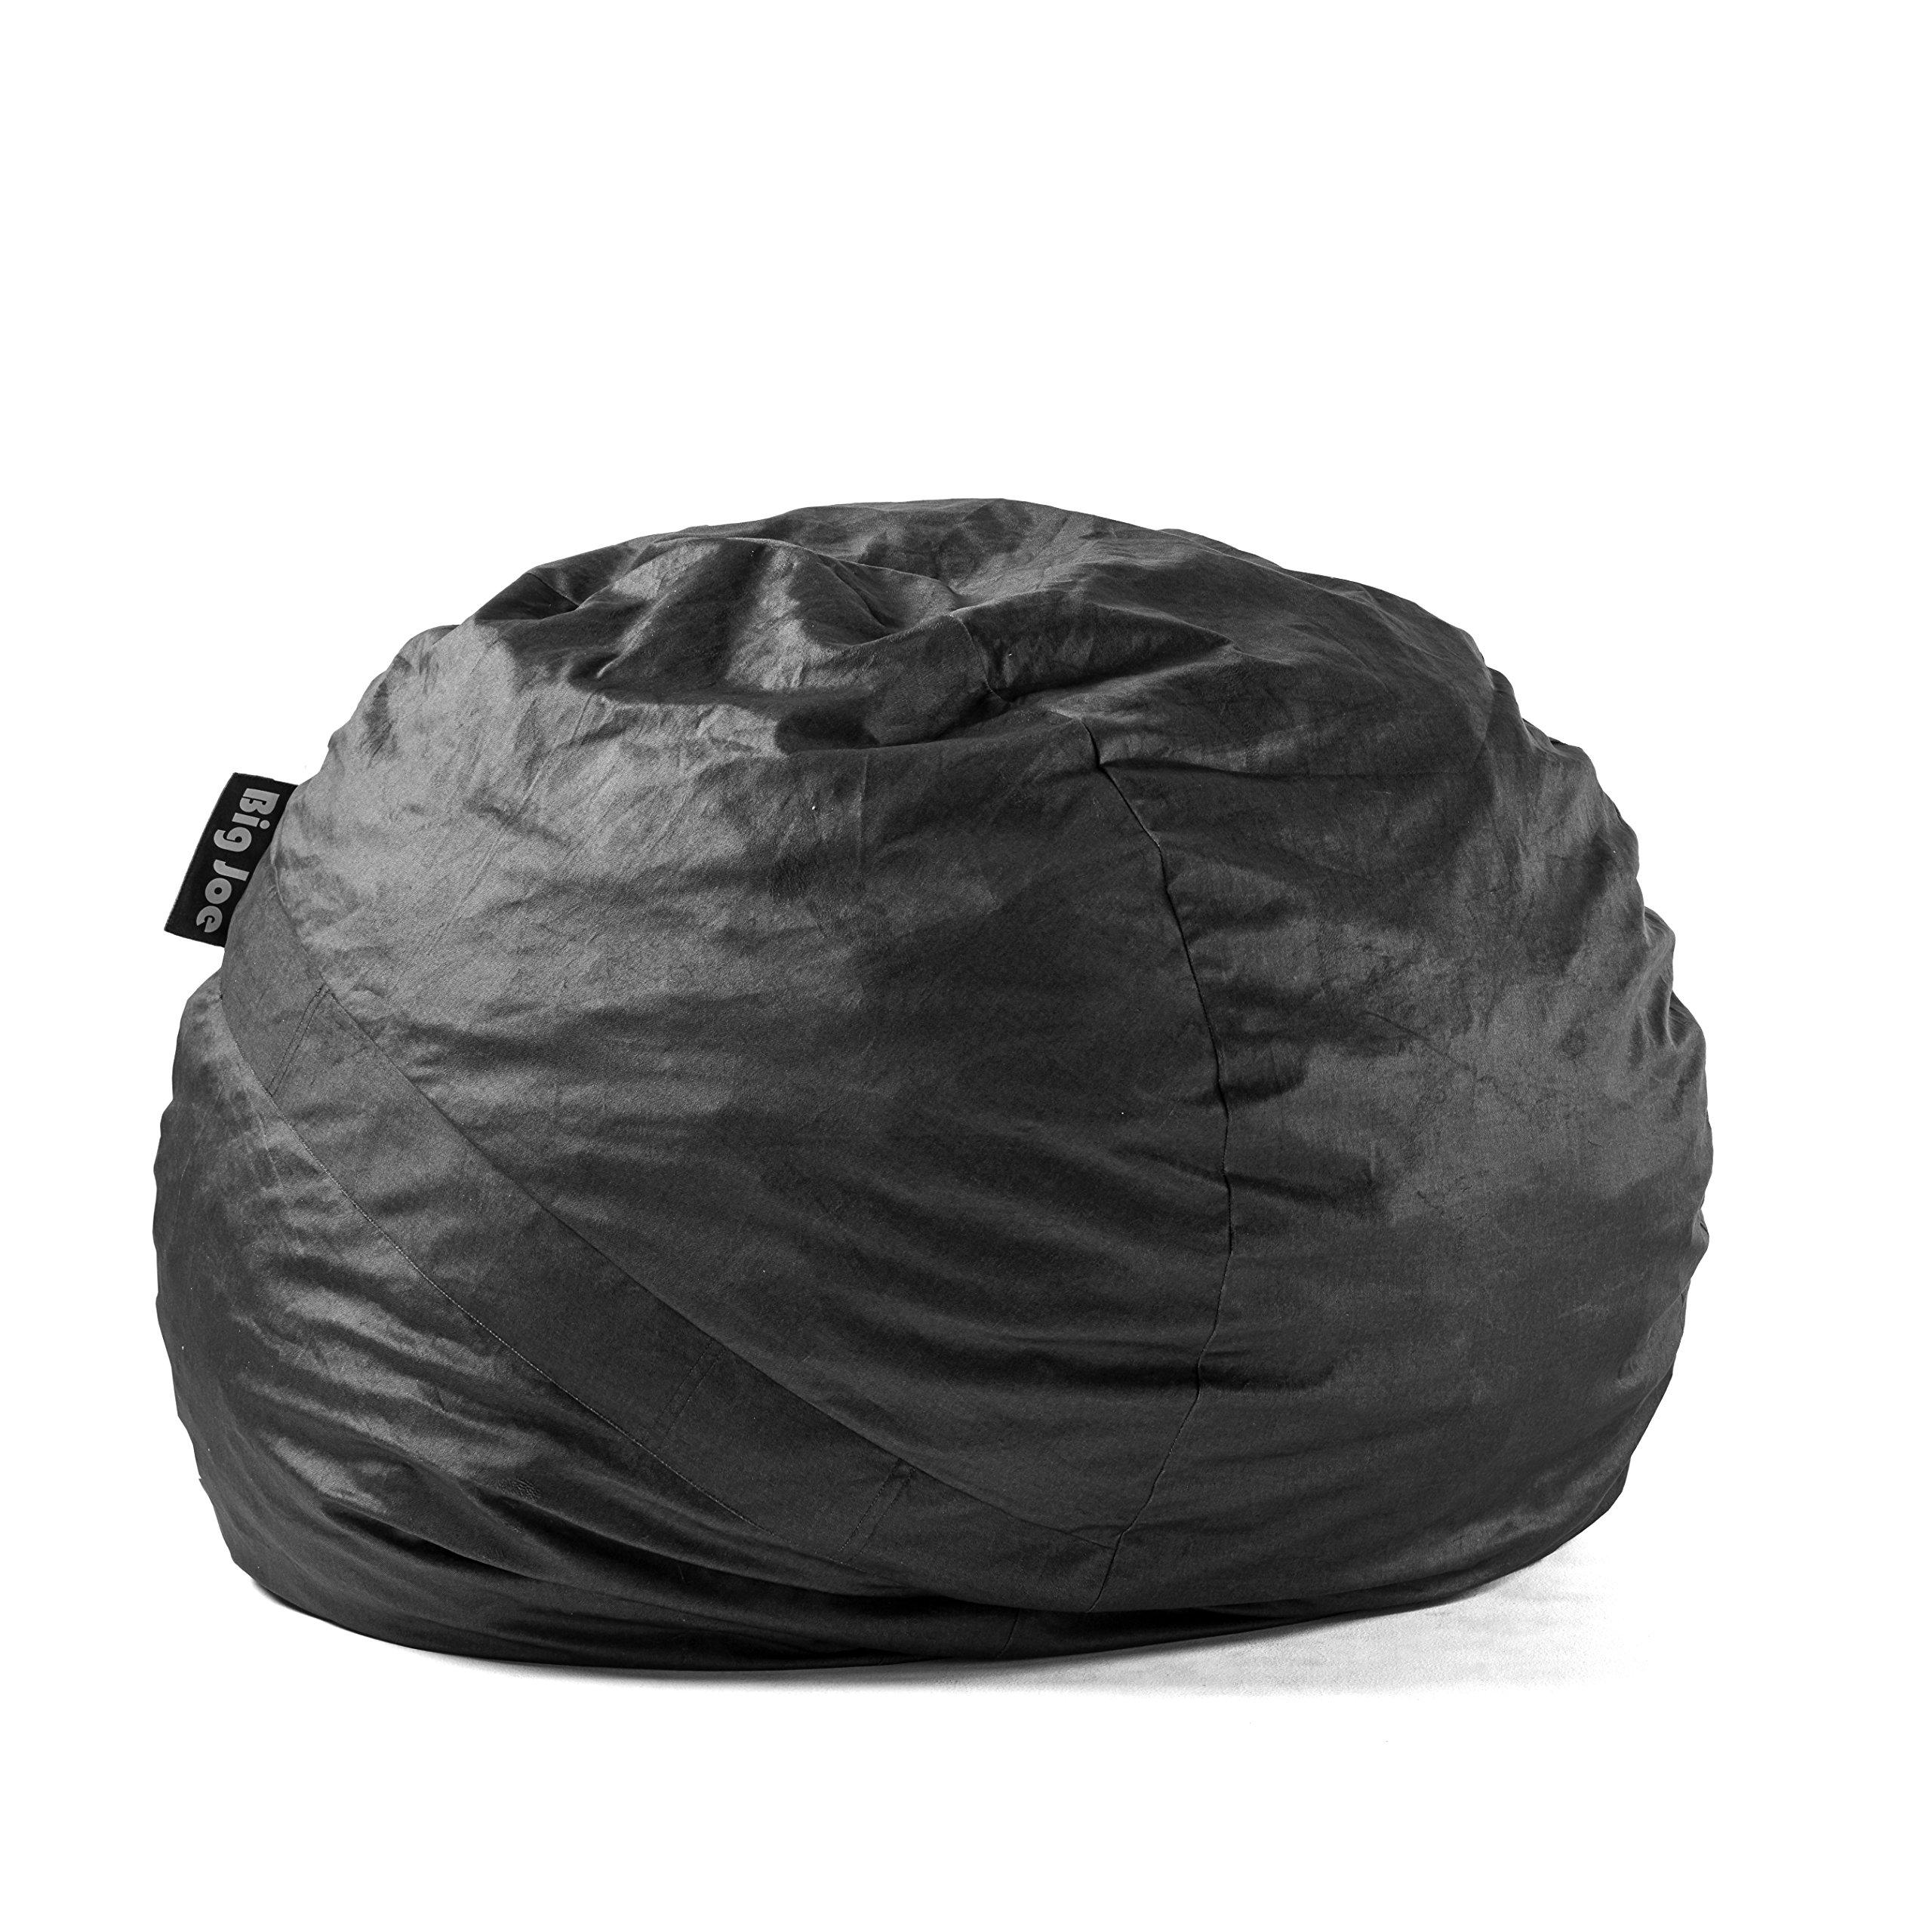 Big Bag Zitzak.Amazon Com Fatboy The Original Bean Bag Chair Blue Kitchen Dining